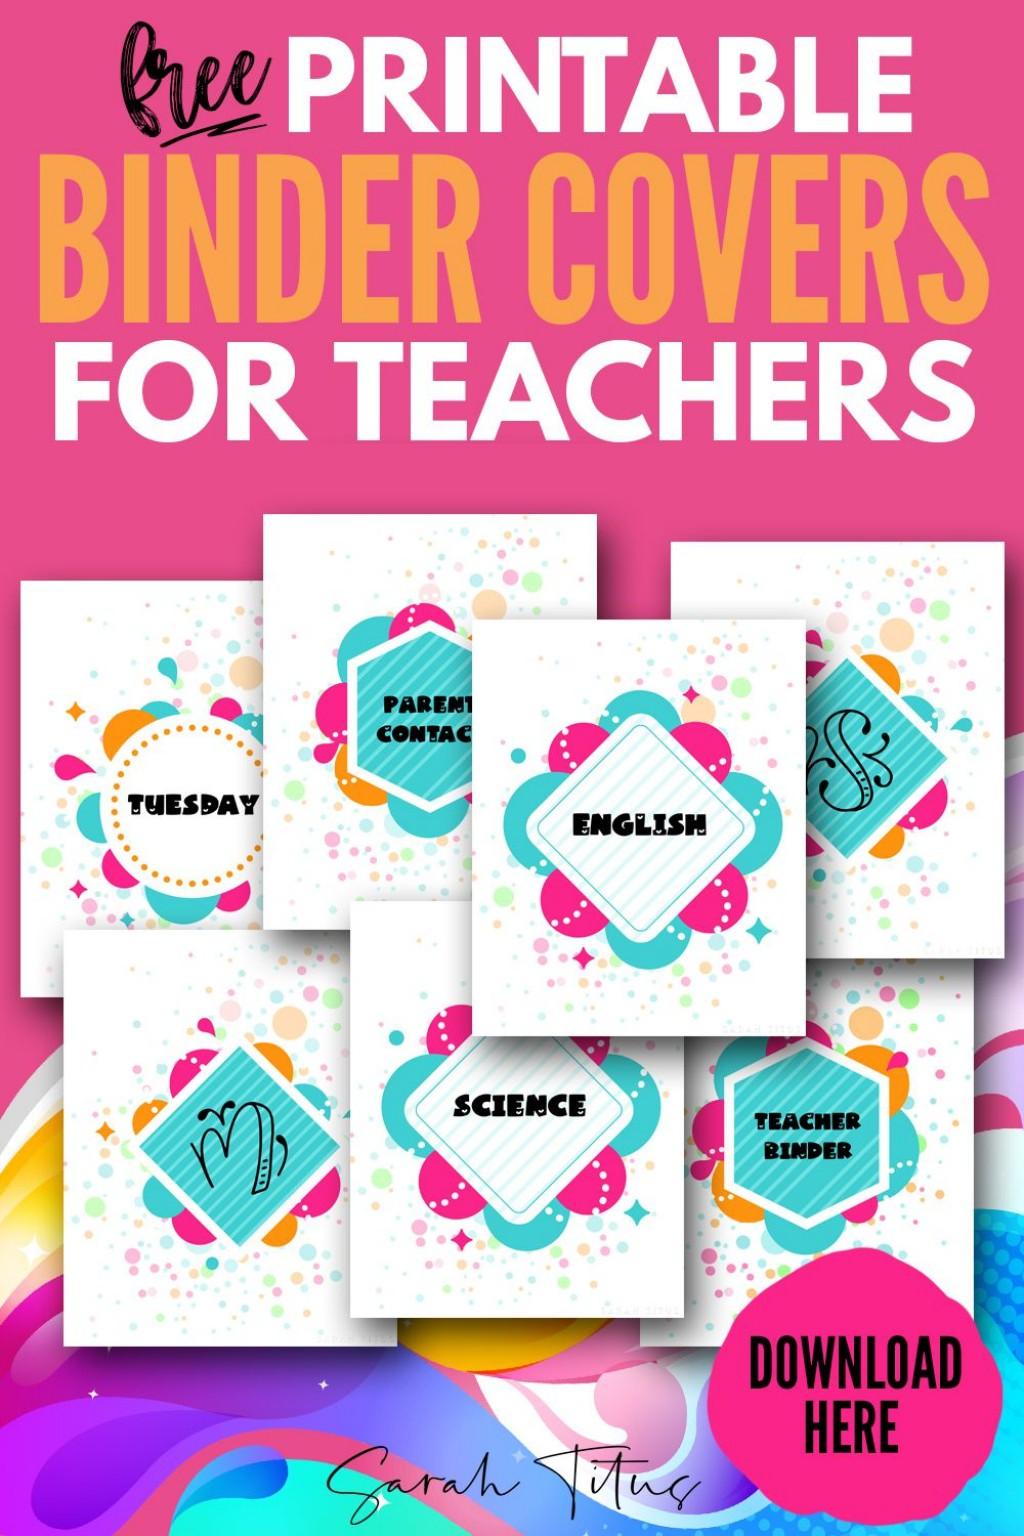 002 Awesome Free Printable Teacher Binder Template Inspiration  TemplatesLarge